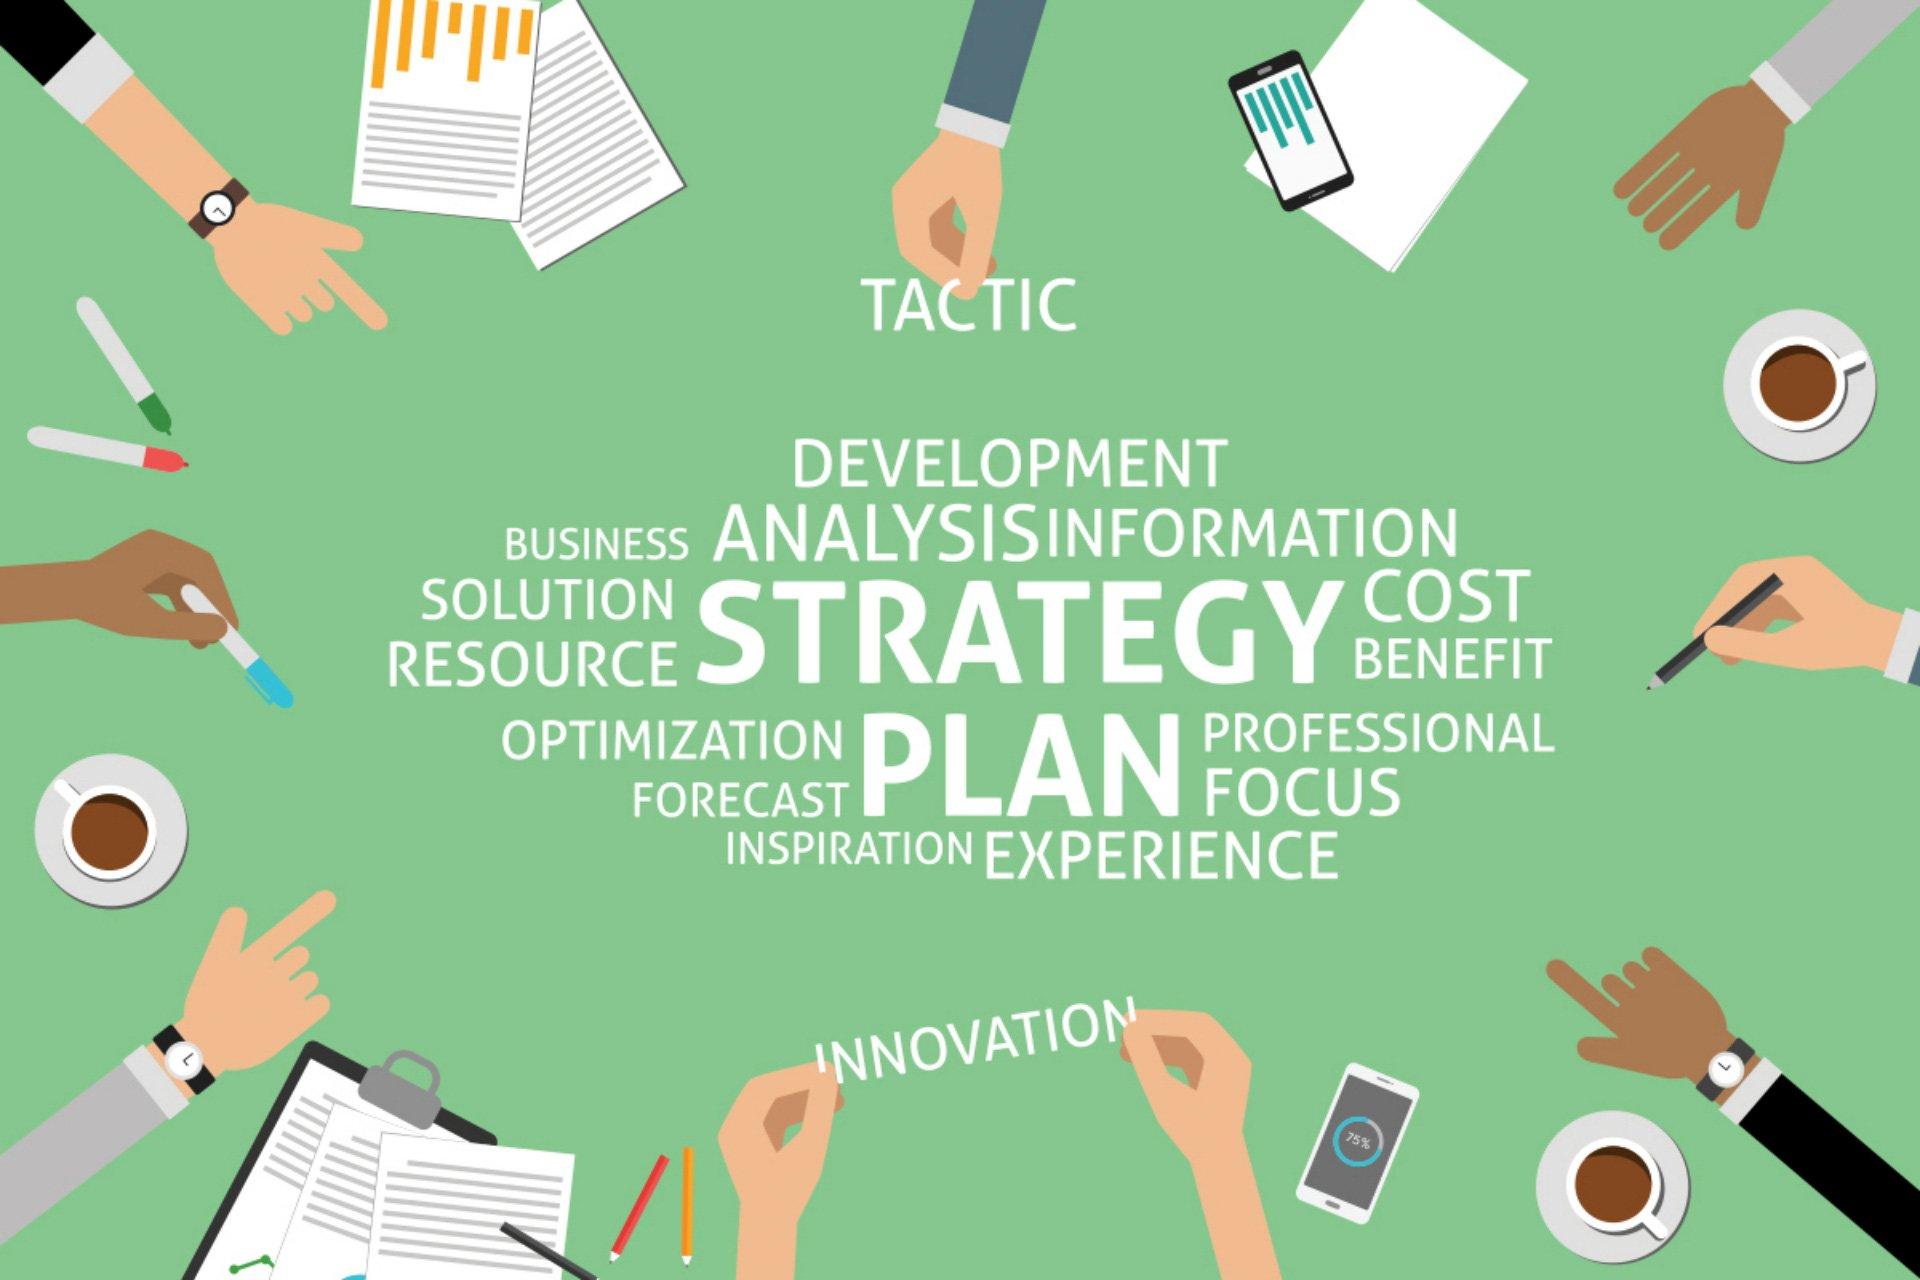 strategic benefit plan